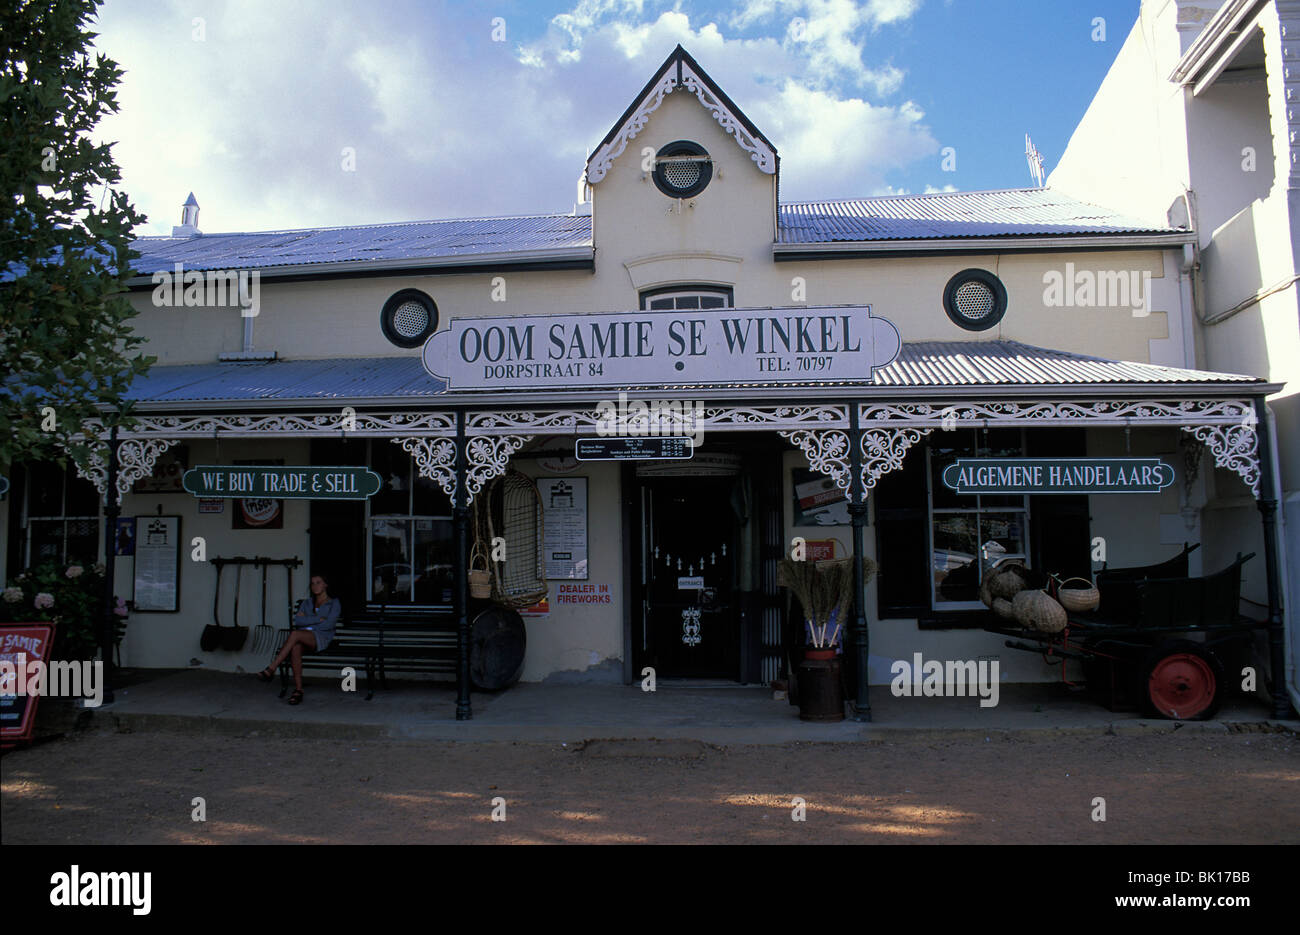 South Africa, Stellenbosch, Oom Samie se winkel Stock Photo